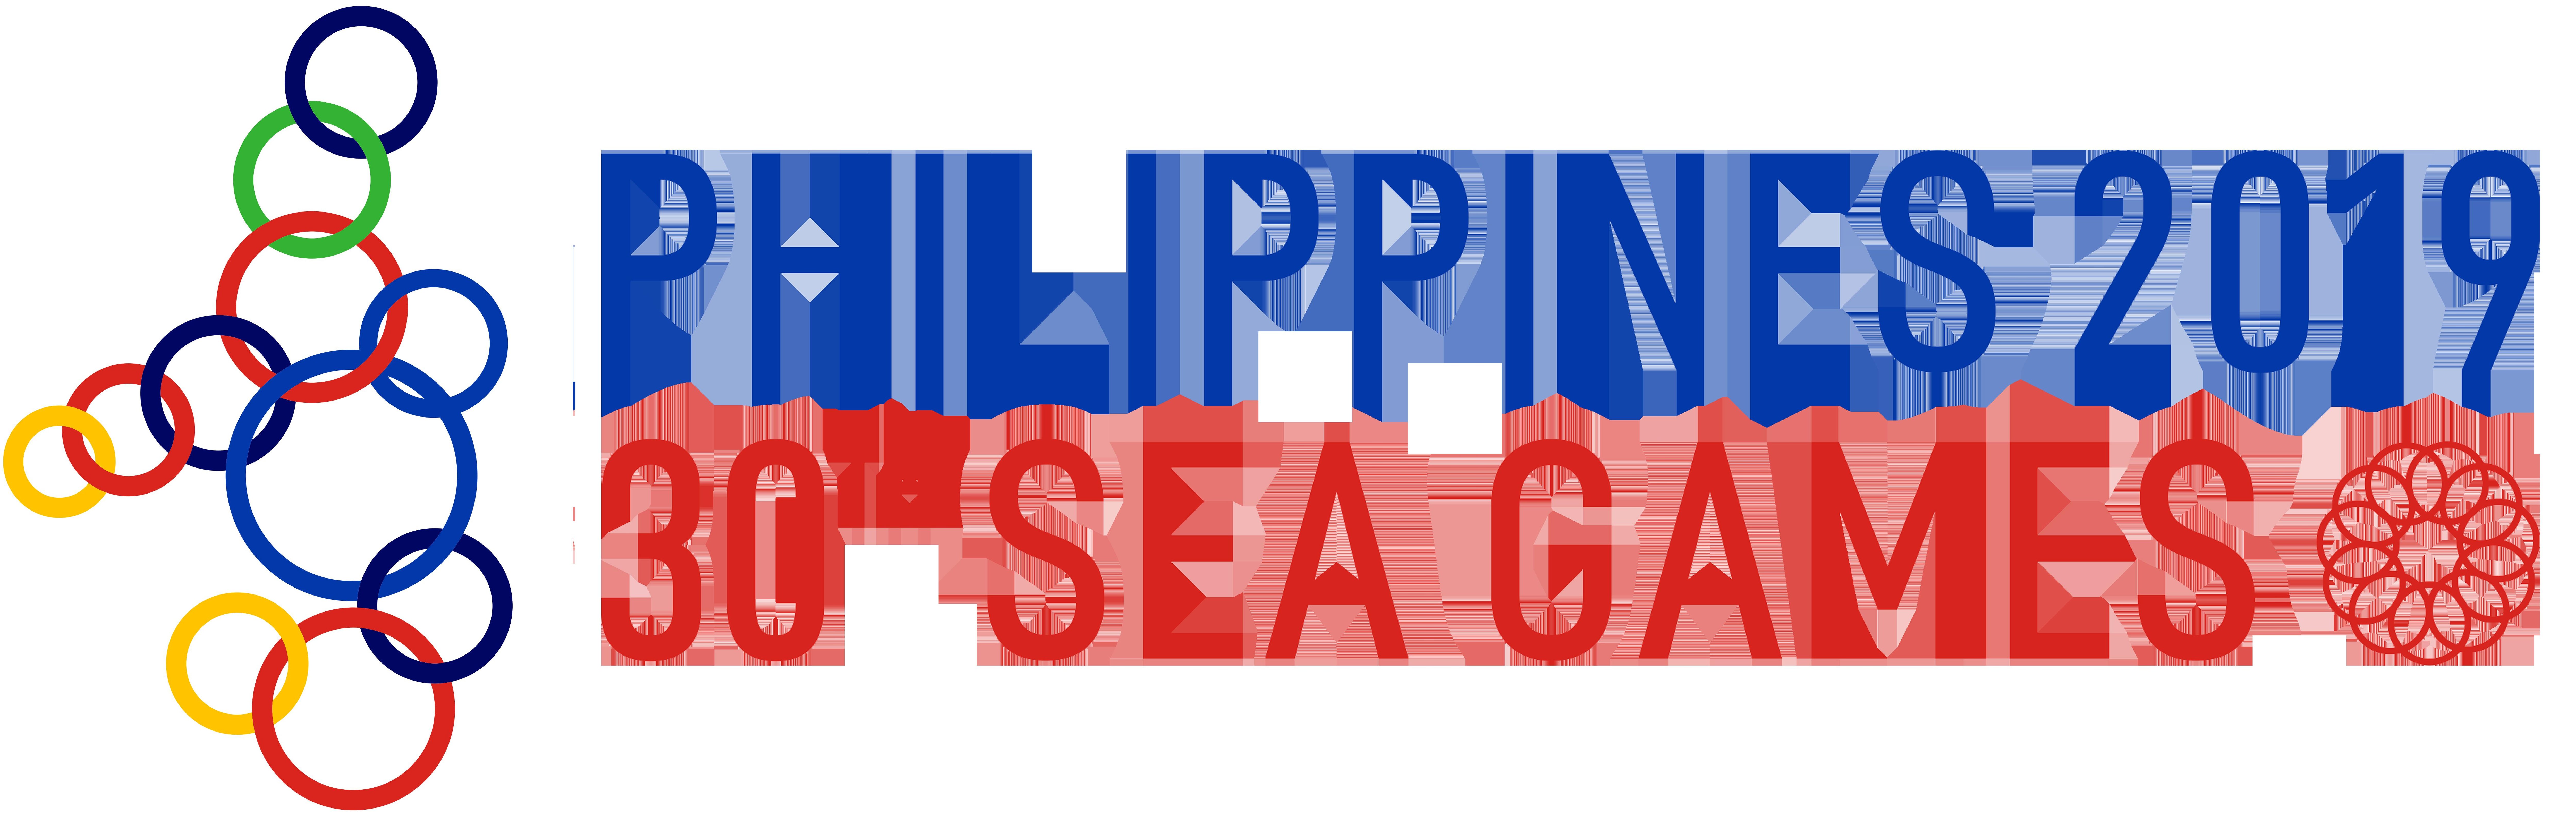 30TH SEA GAMES PHILIPPINES 2019